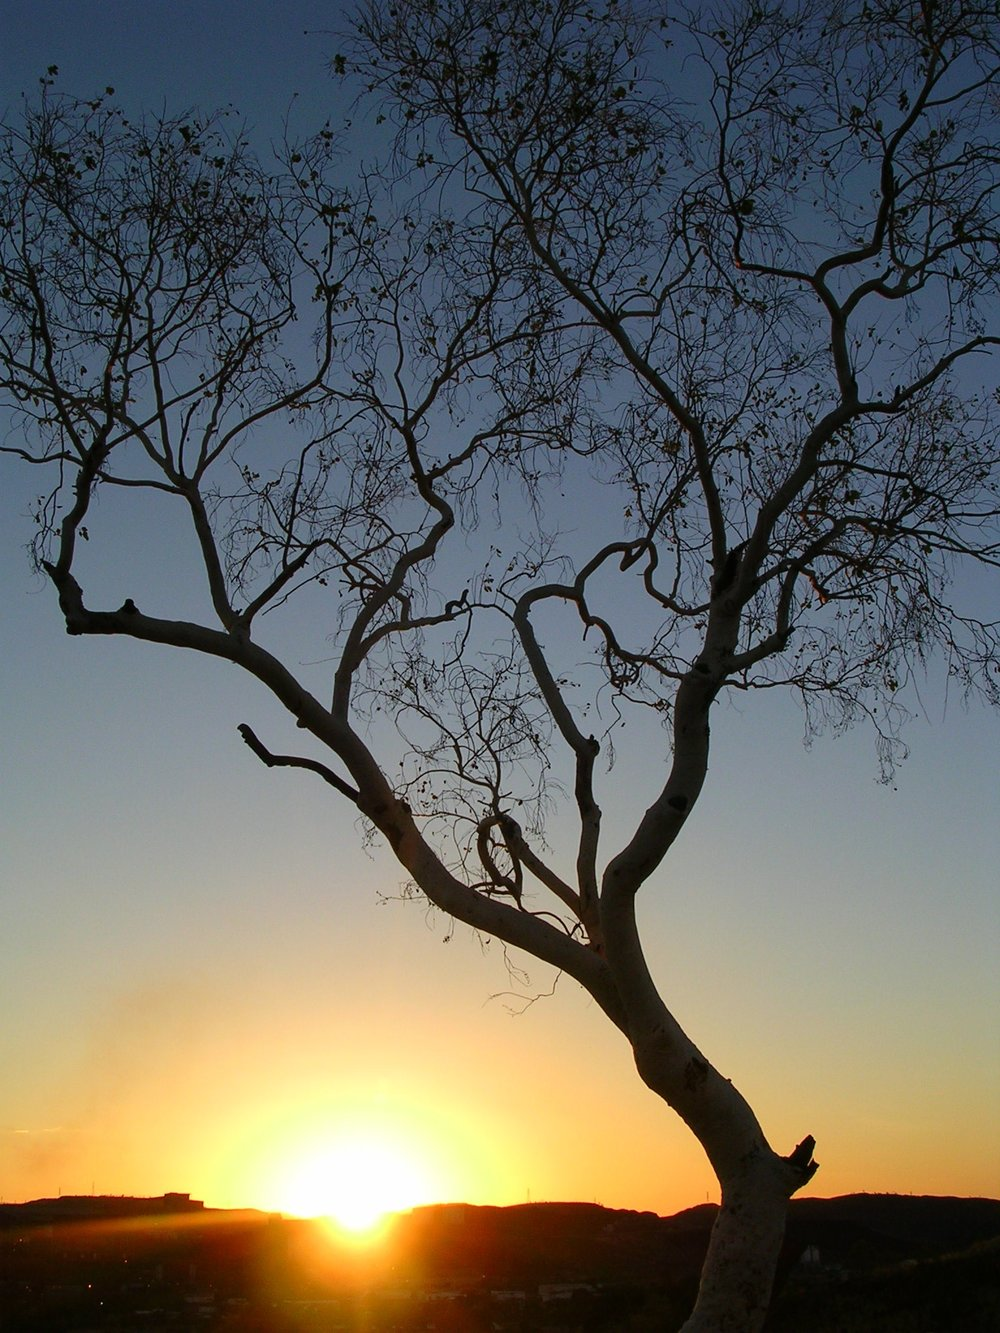 sun_set_at_mt__isa_by_putrescent_pen.jpg